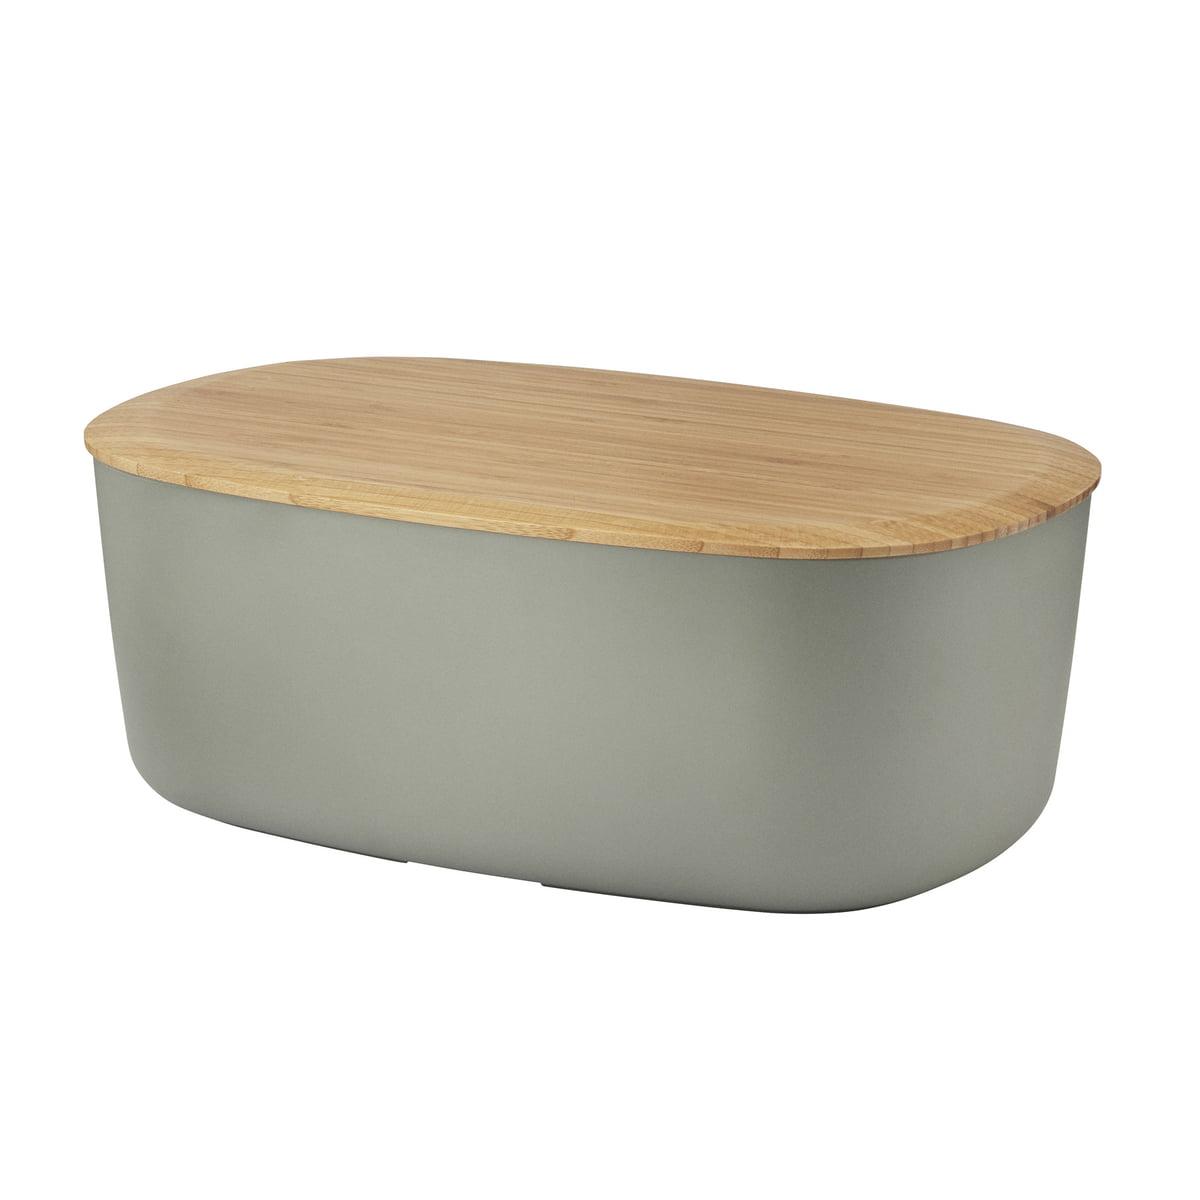 Stelton Rig-Tig by Stelton - Box-It Boîte à pain, gris